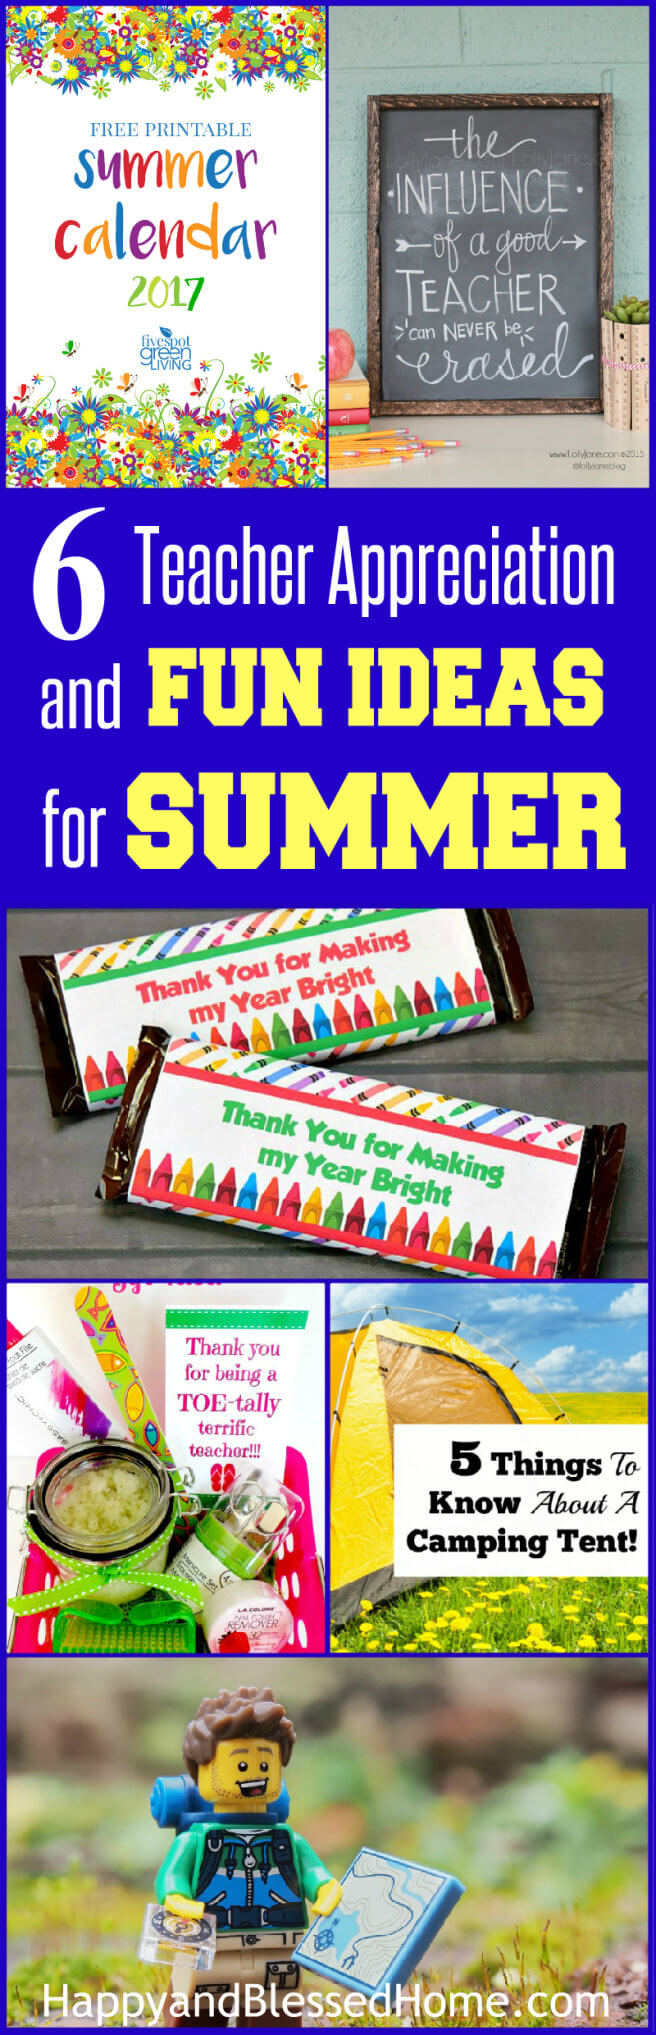 6 Teacher Appreciation and Fun Ideas for Summer